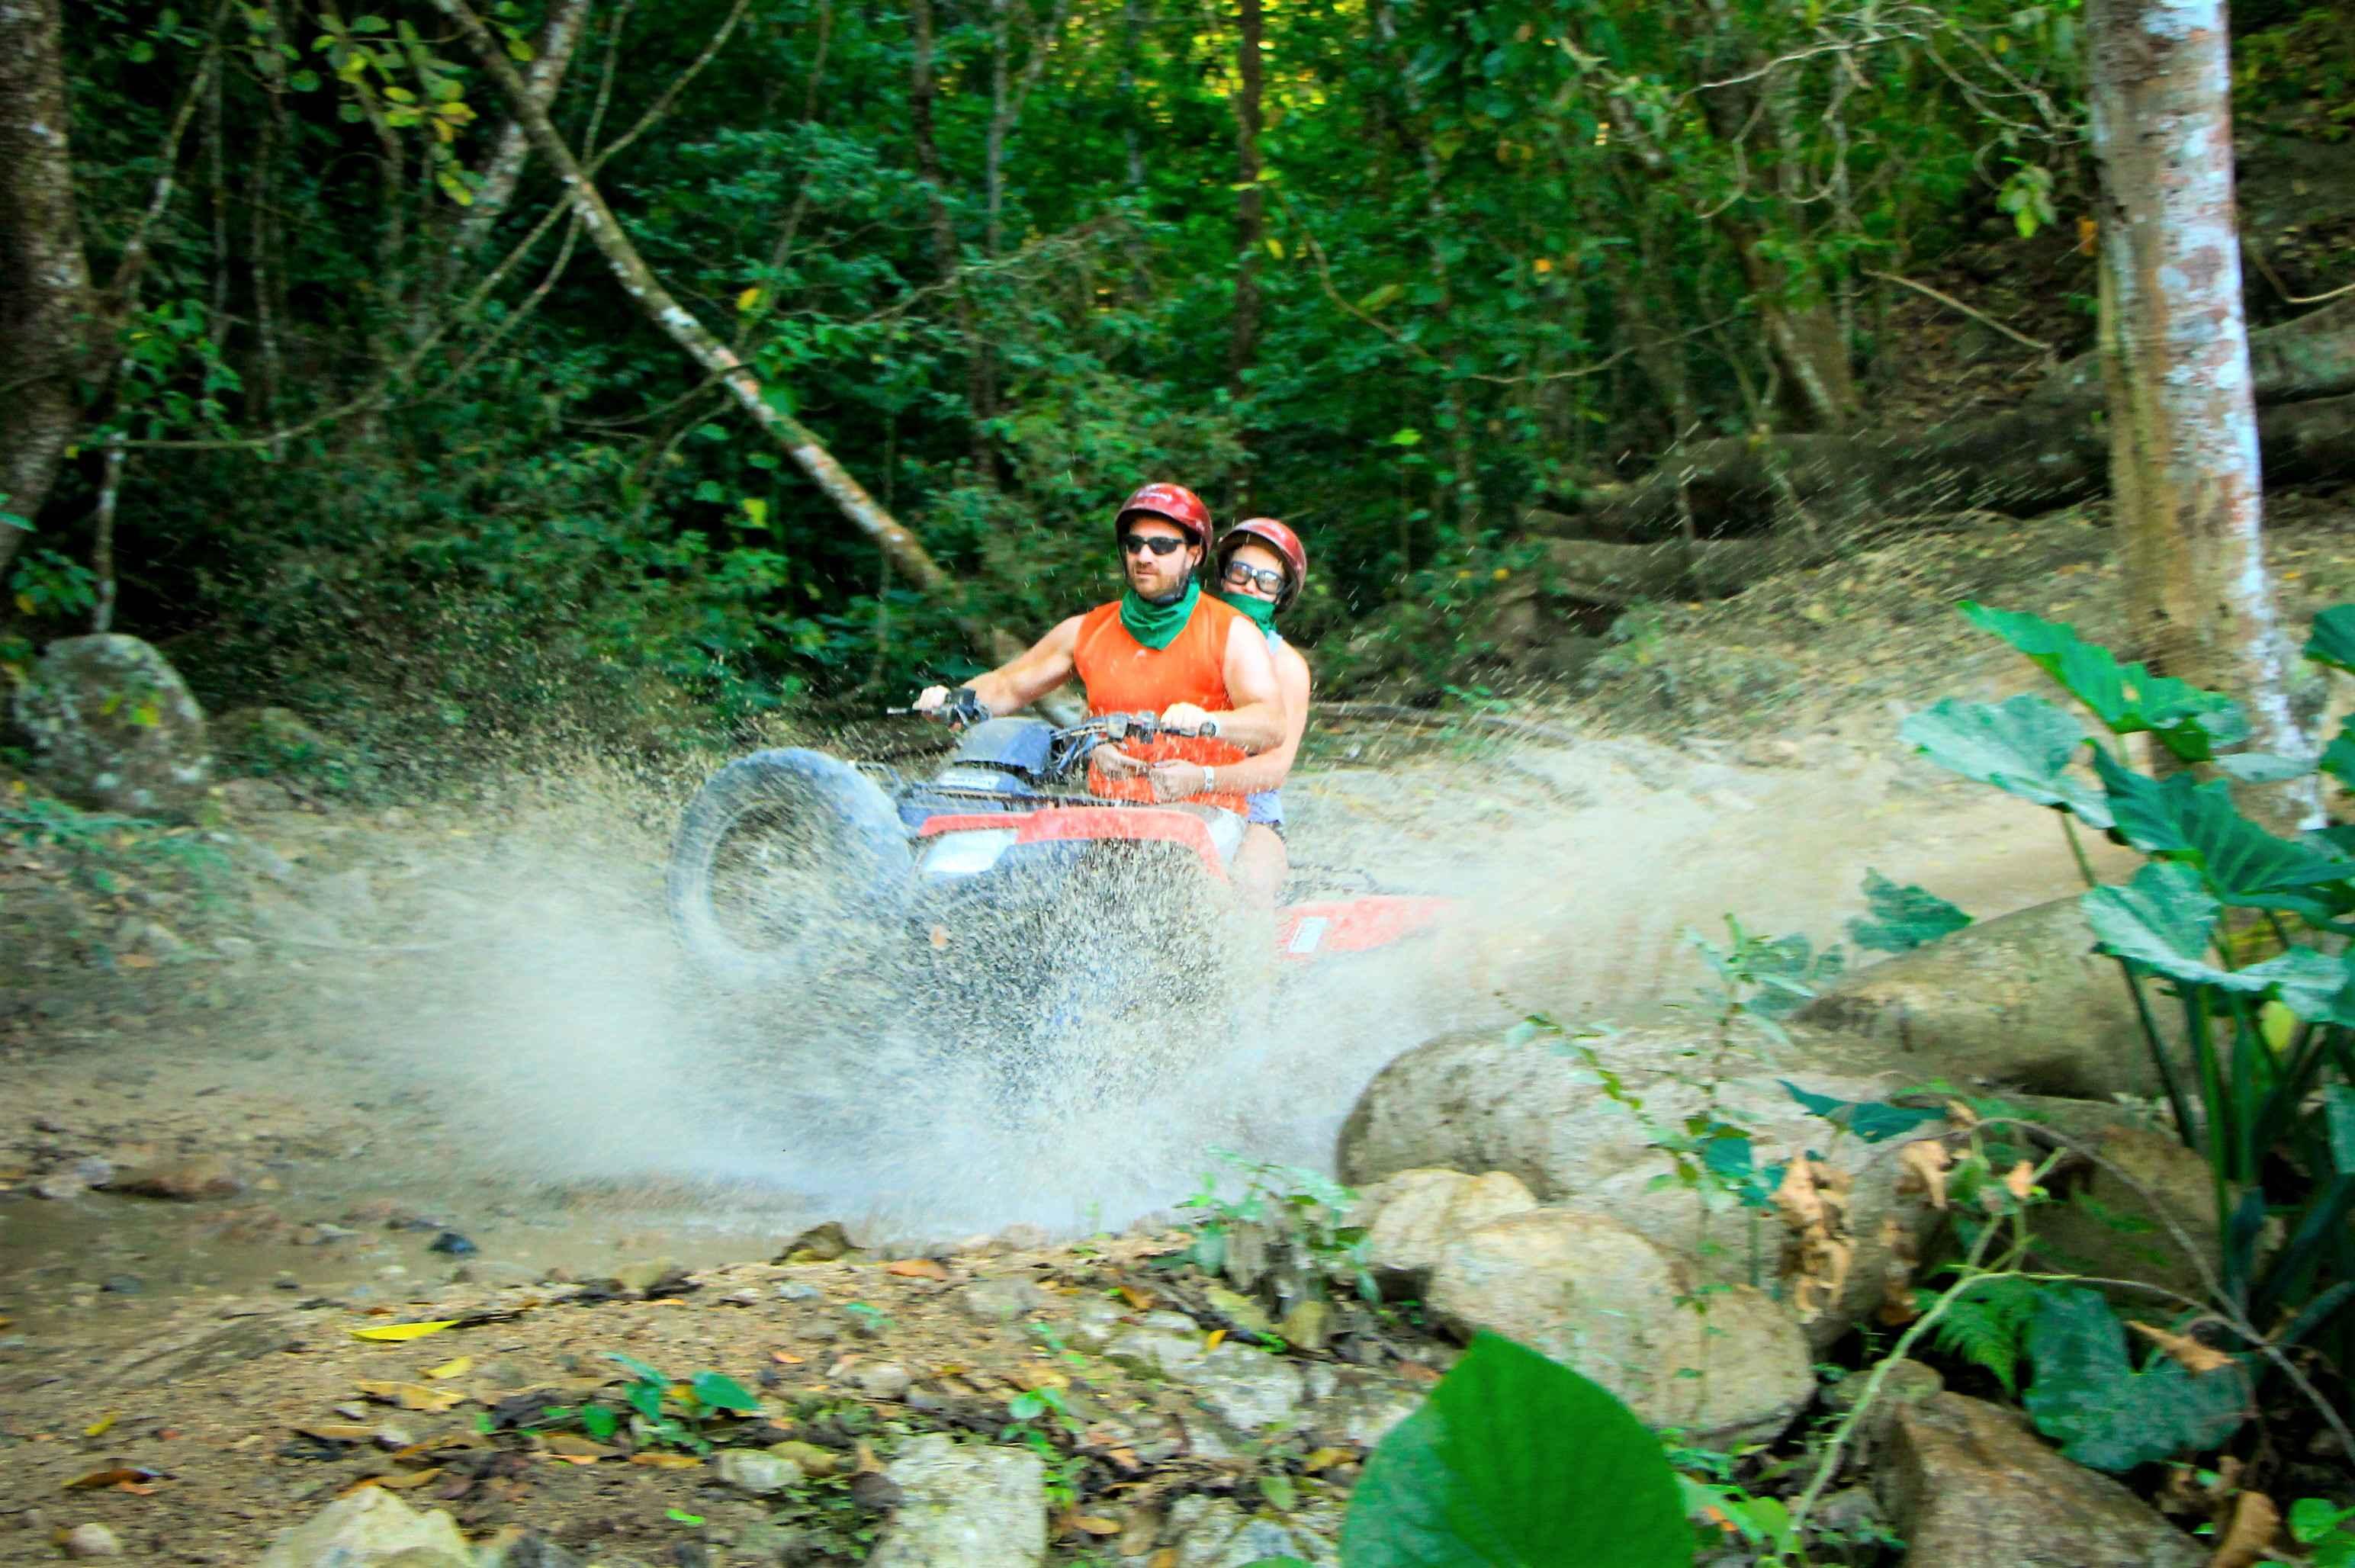 Double Atv - River Route - Last Minute Tours in Puerto Vallarta